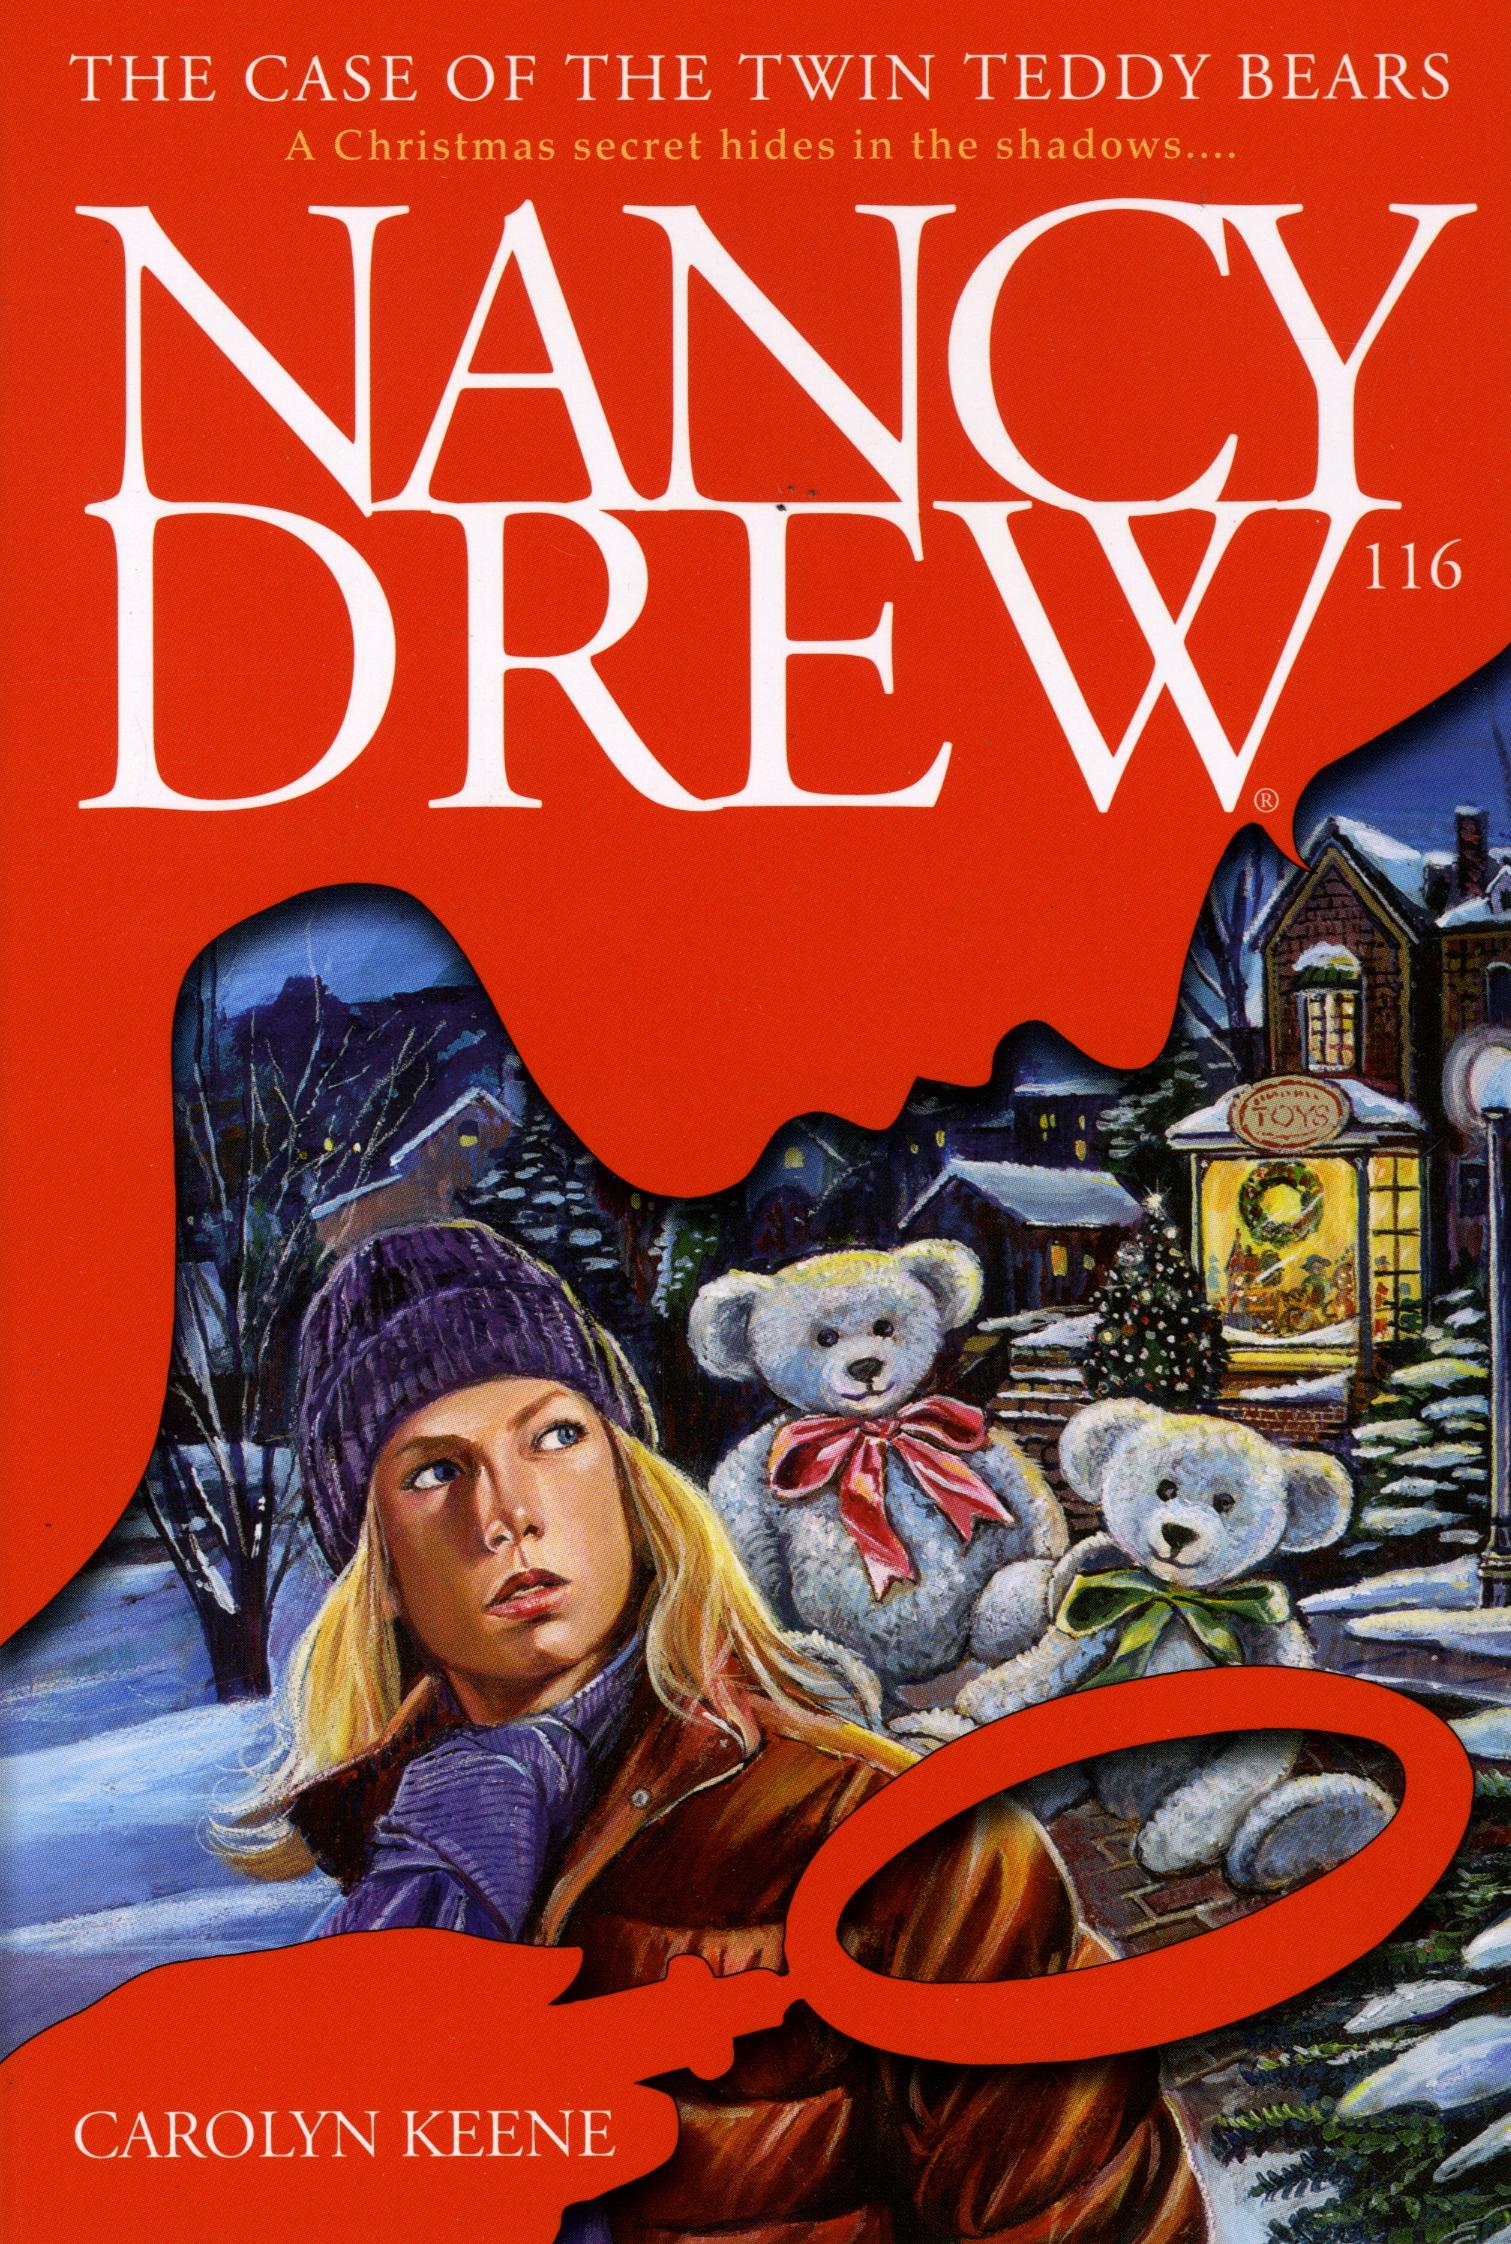 The Case Of the Twin Teddy Bears by Keene, Carolyn